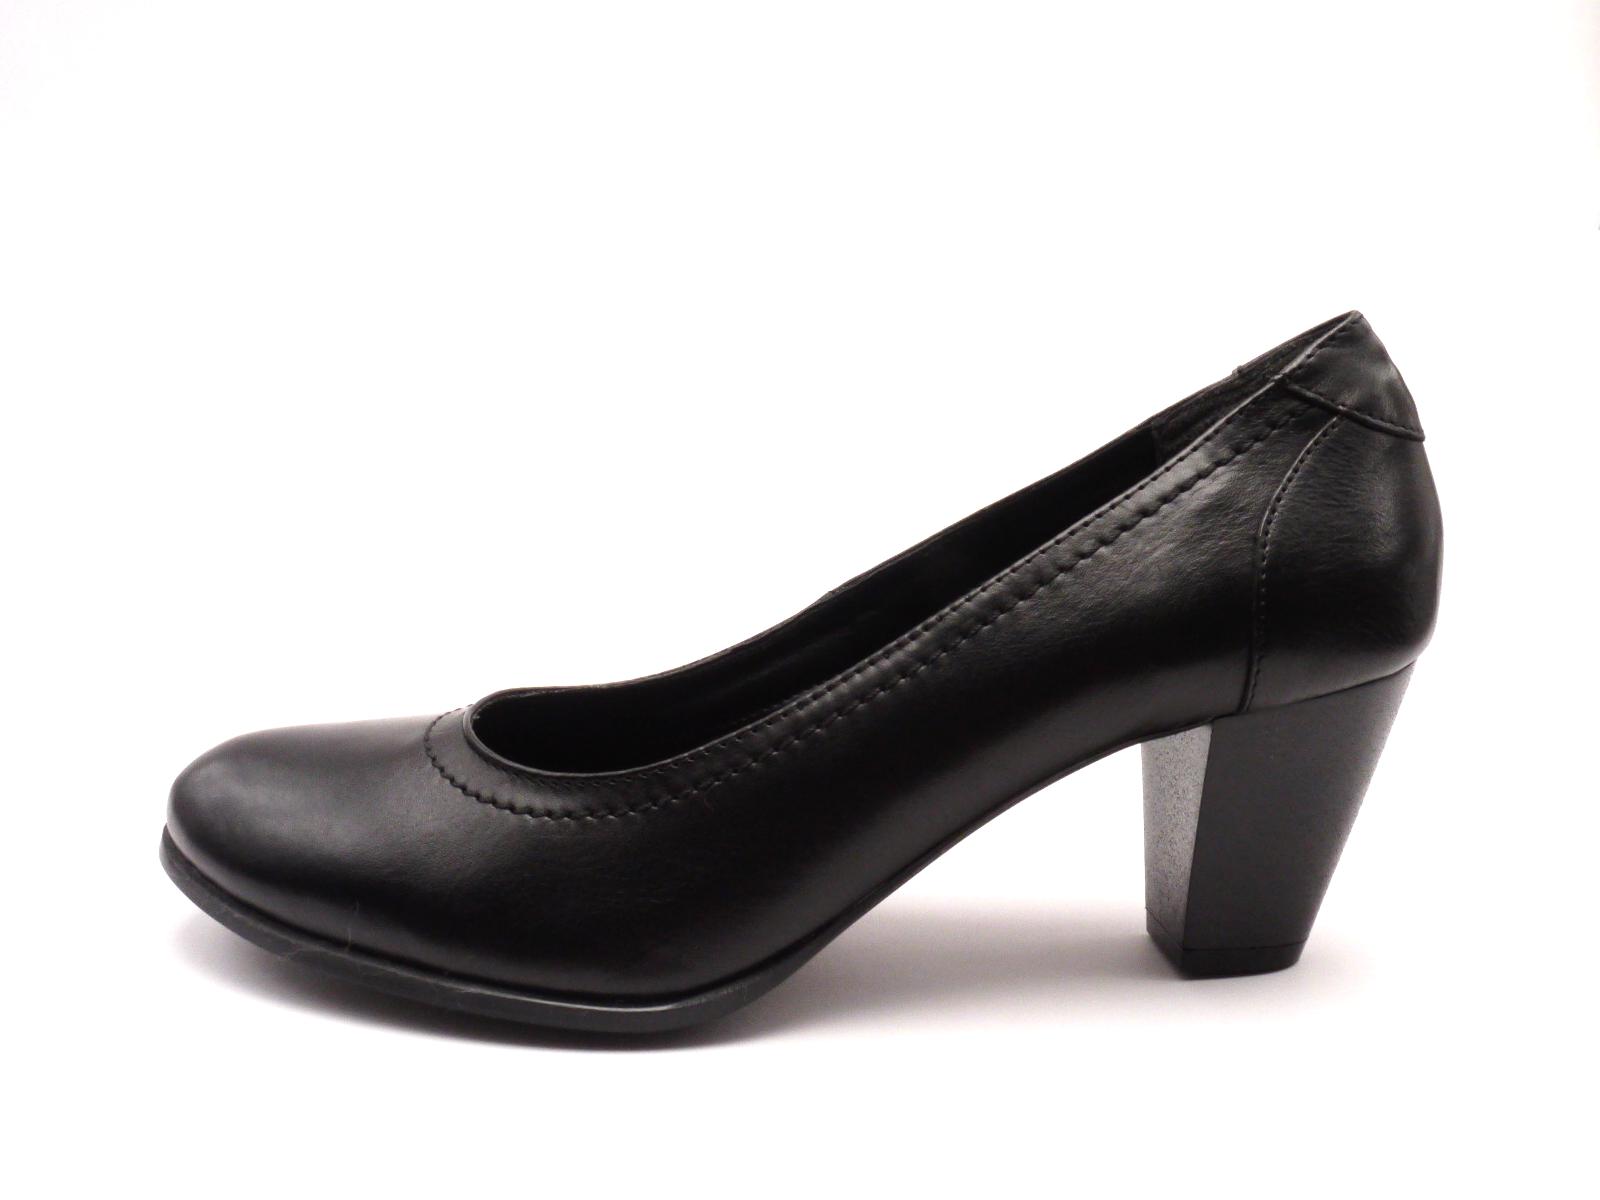 Relax shoes Elegantní lodičky 100-105 Velikost: 42